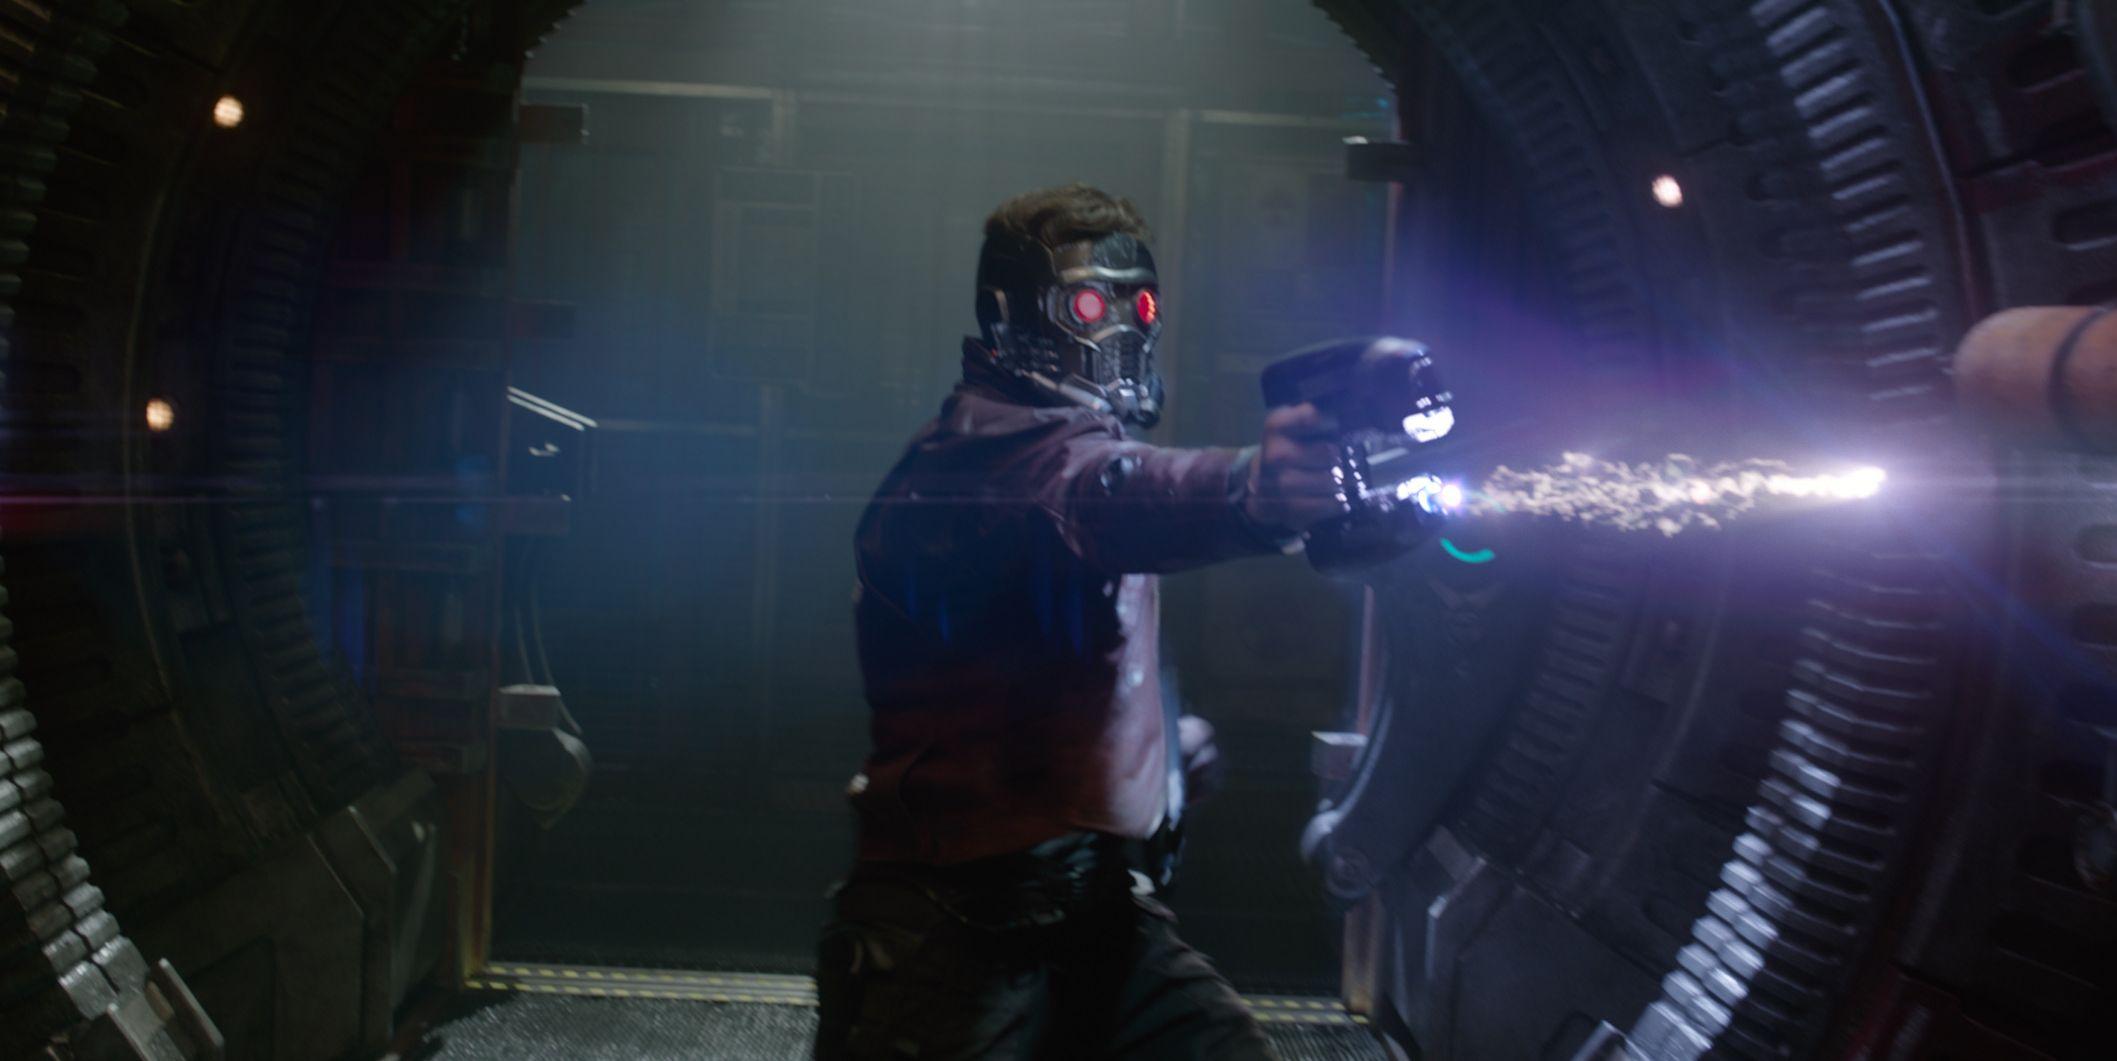 Chris Pratt as Star Lord